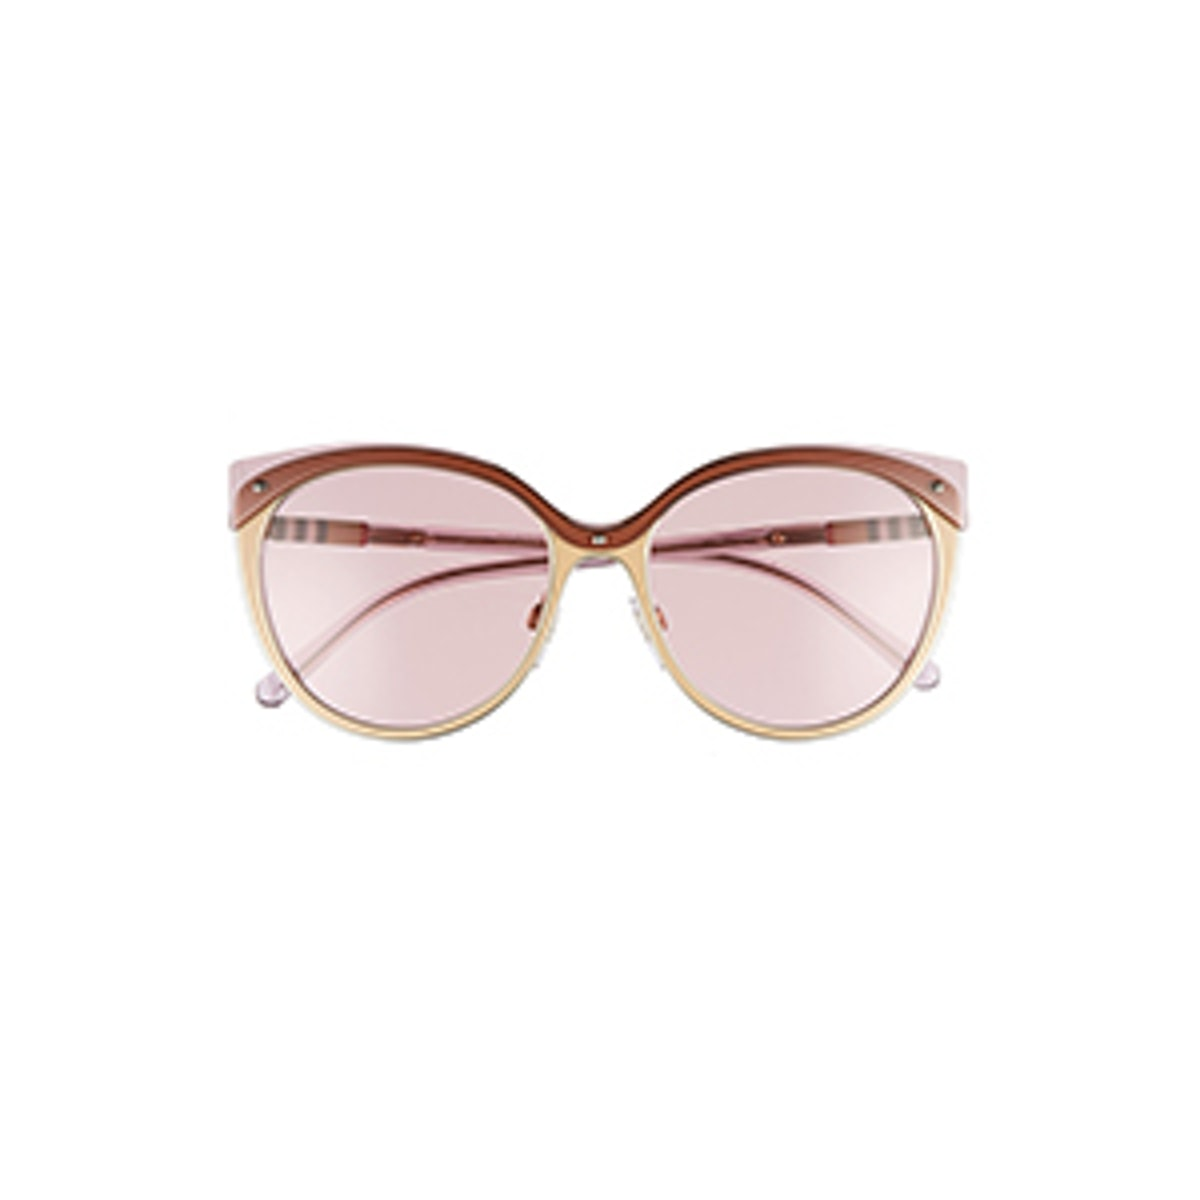 Heritage 55mm Cat Eye Sunglasses